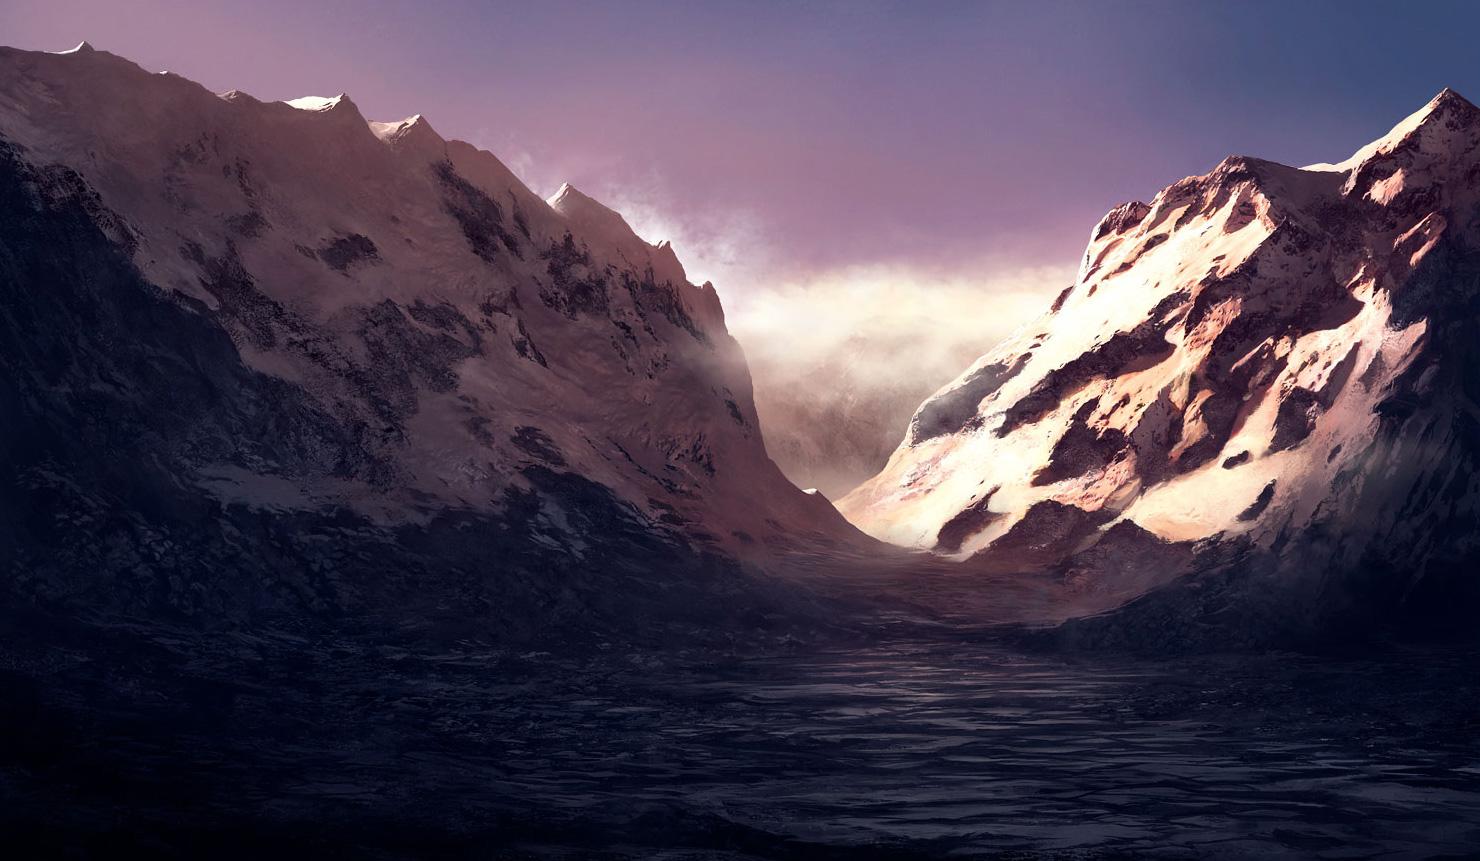 Amazing Wallpapers 3d Snowy Sunrise Coolvibe Digital Artcoolvibe Digital Art